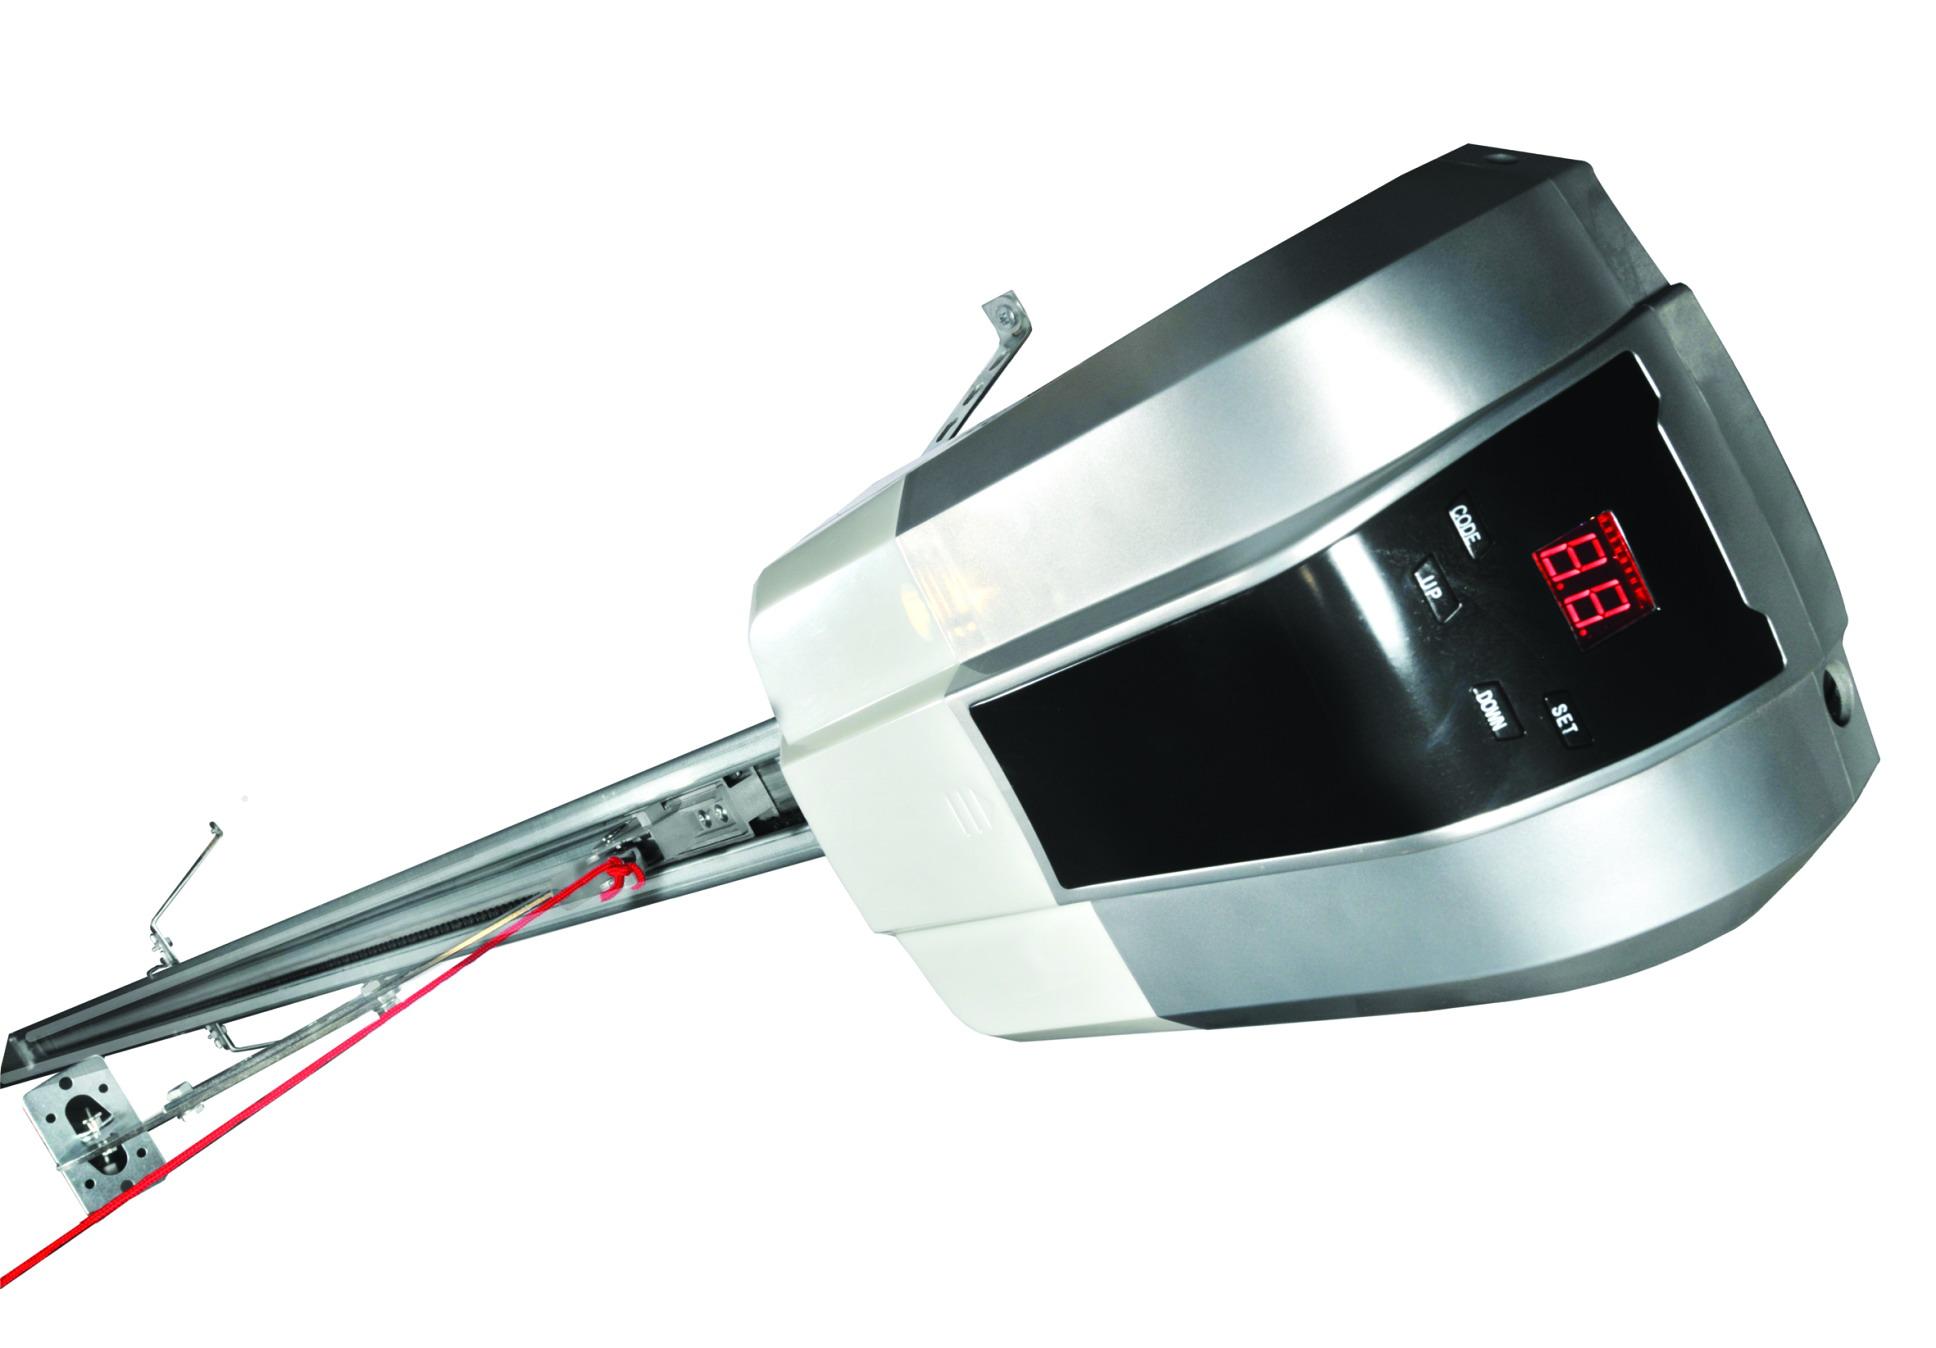 Автоматика для гаражных секционных ворот  AN-MOTORS ASG600/3KIT-L, ASG1000/3KIT-L, ASG1000/4KIT - купить по выгодной цене